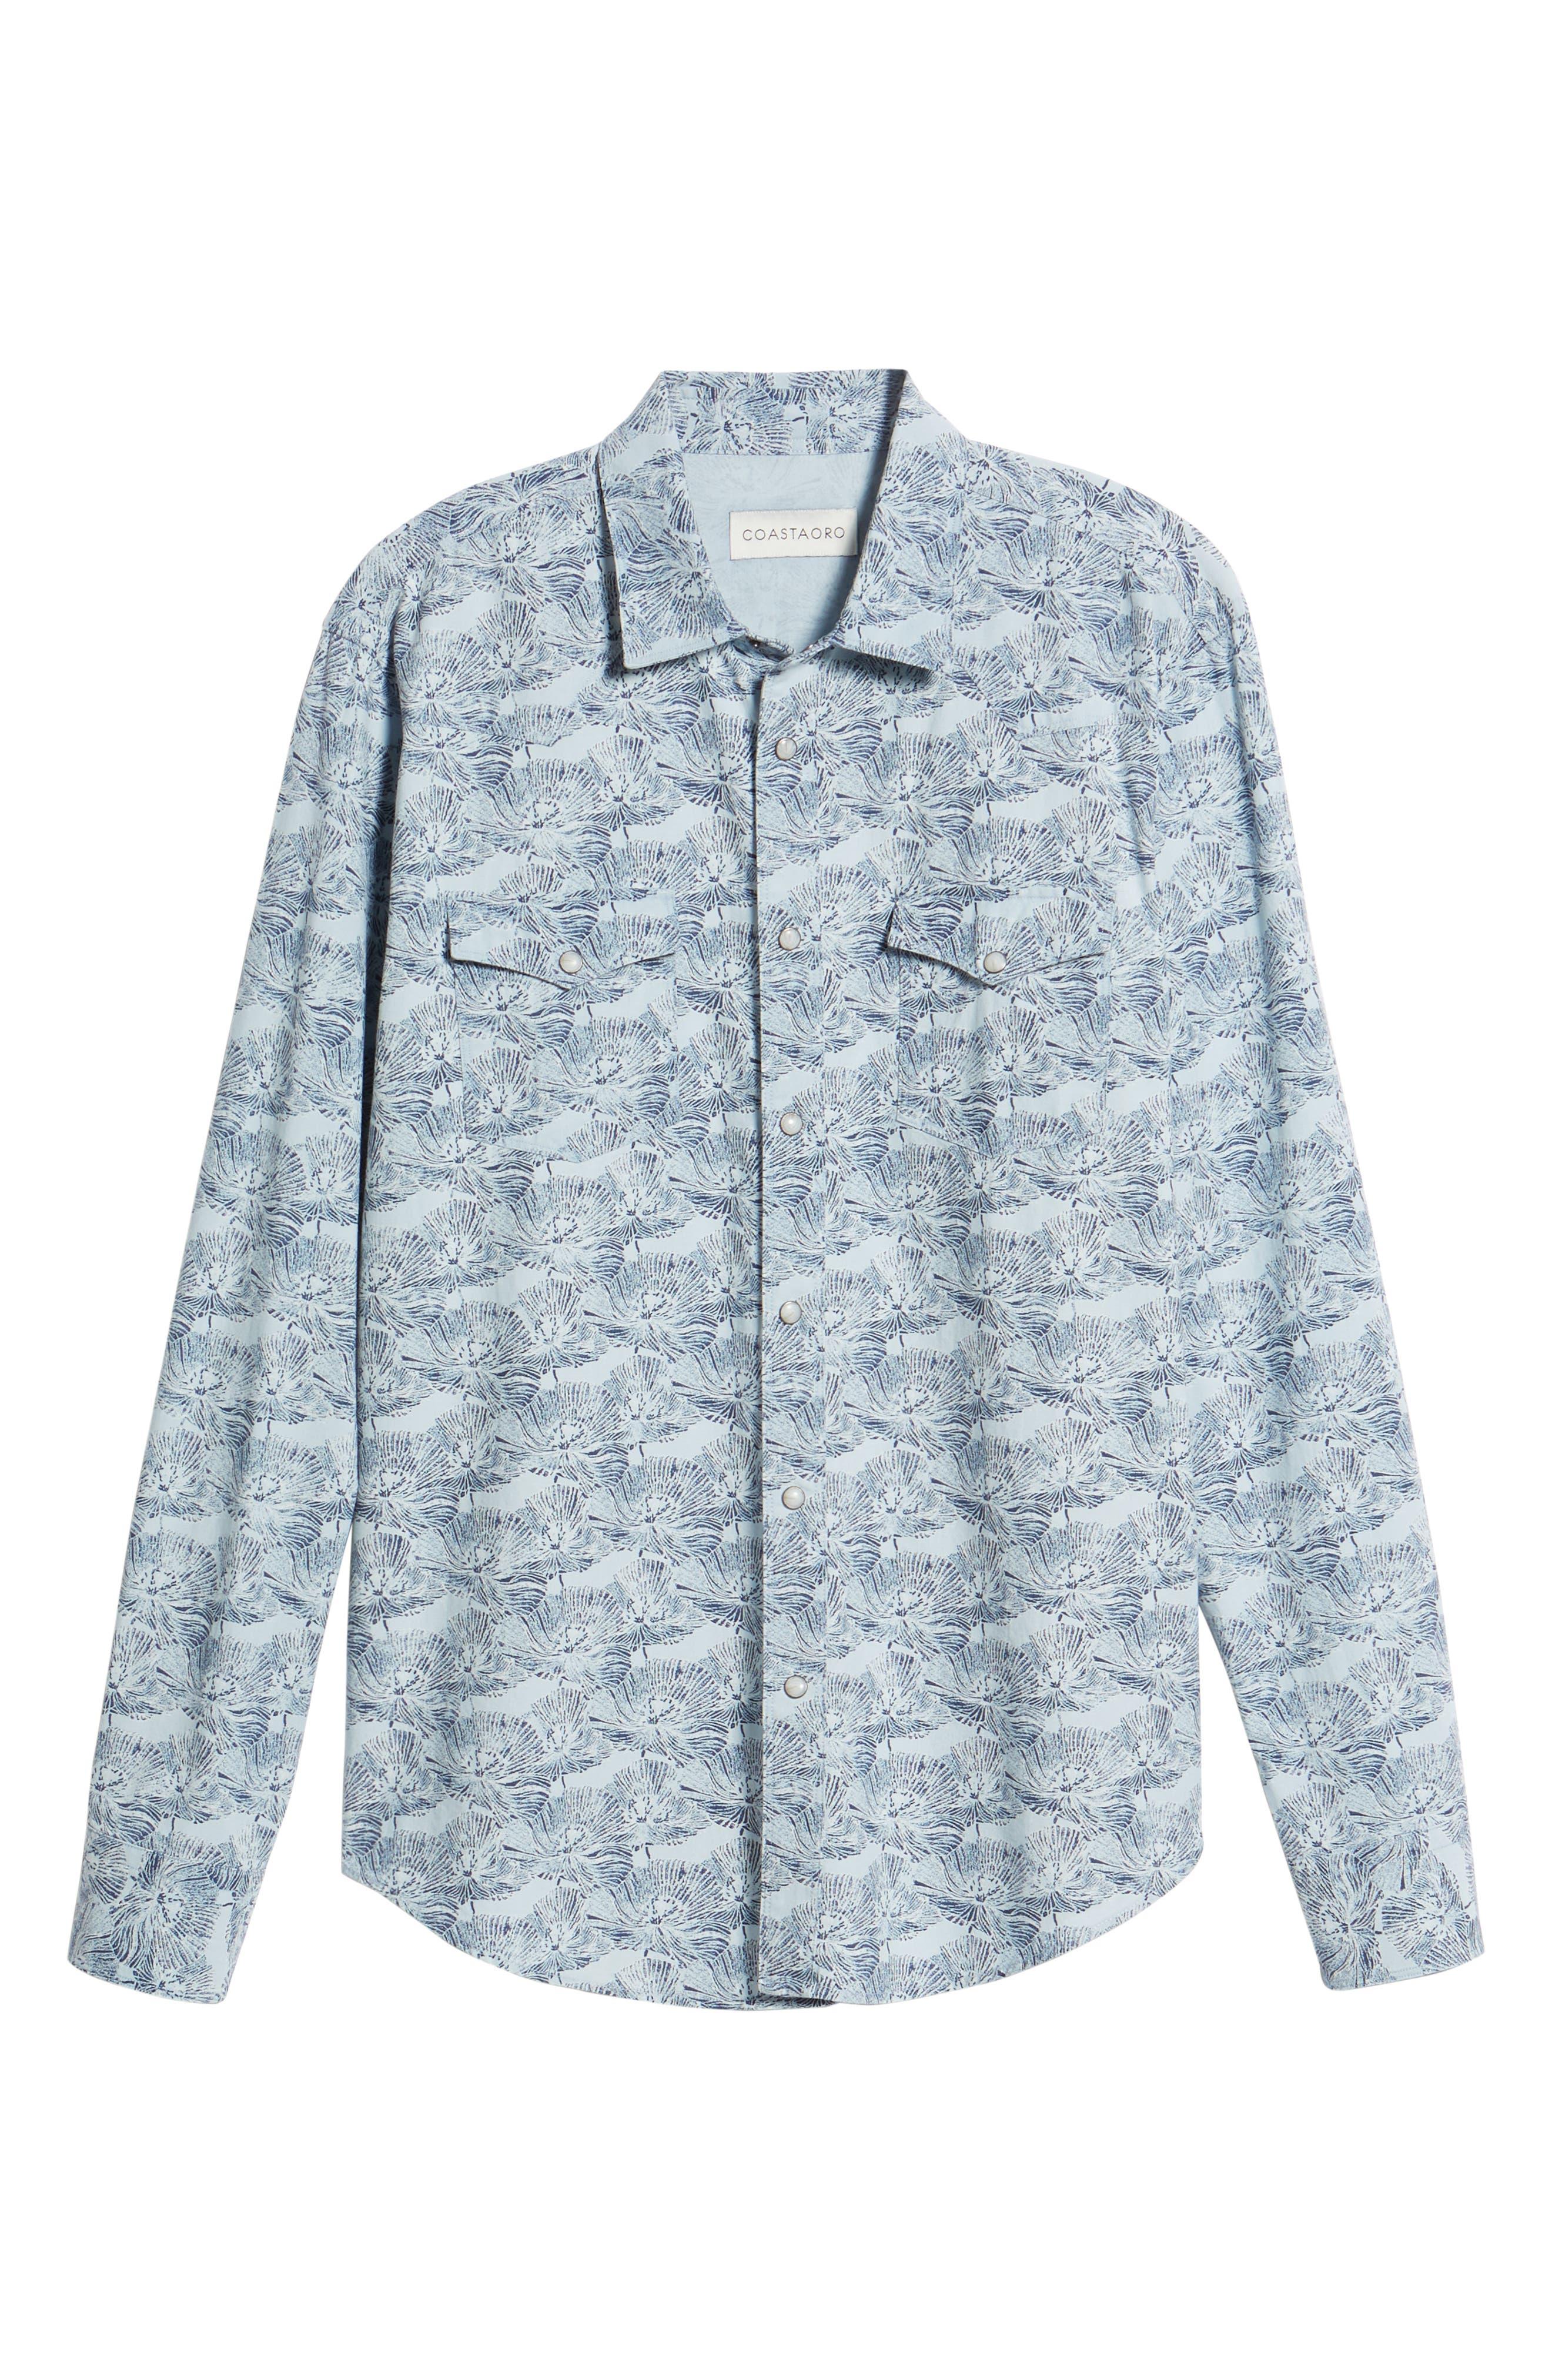 Zumas Vaquero Regular Fit Floral Sport Shirt,                             Alternate thumbnail 6, color,                             Indigo